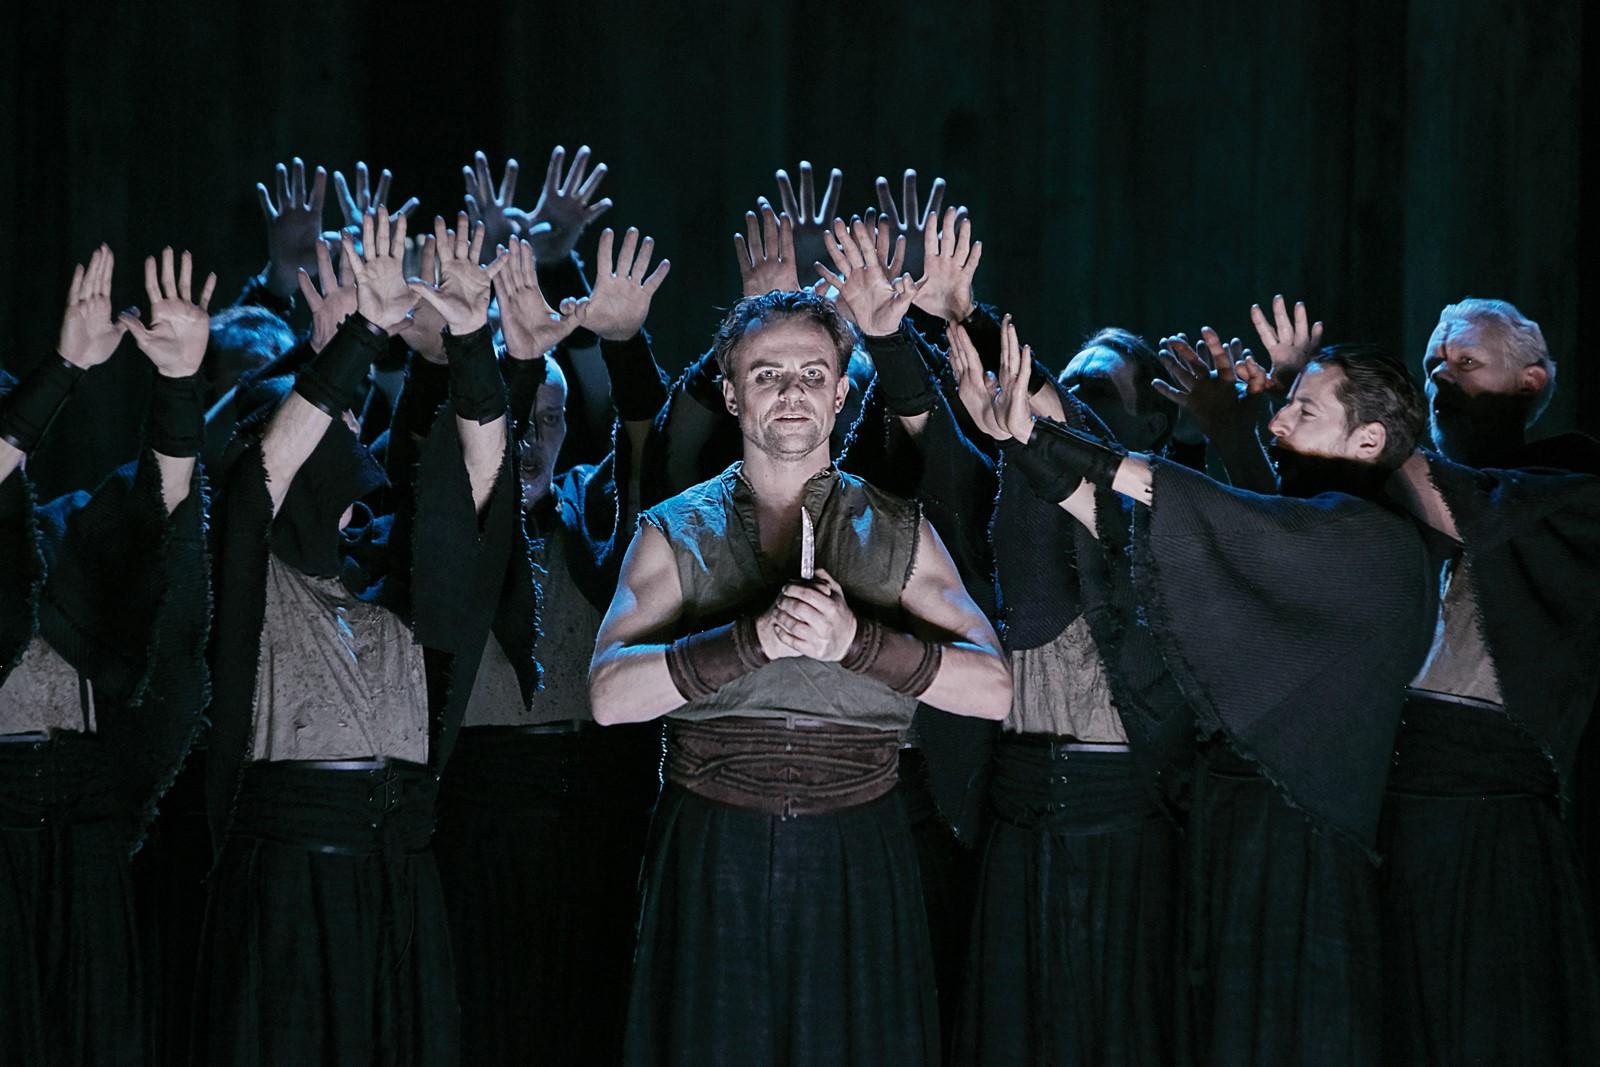 Anmeldelse: Kleopatra, Det Kongelige Teater (Den Jyske Opera)